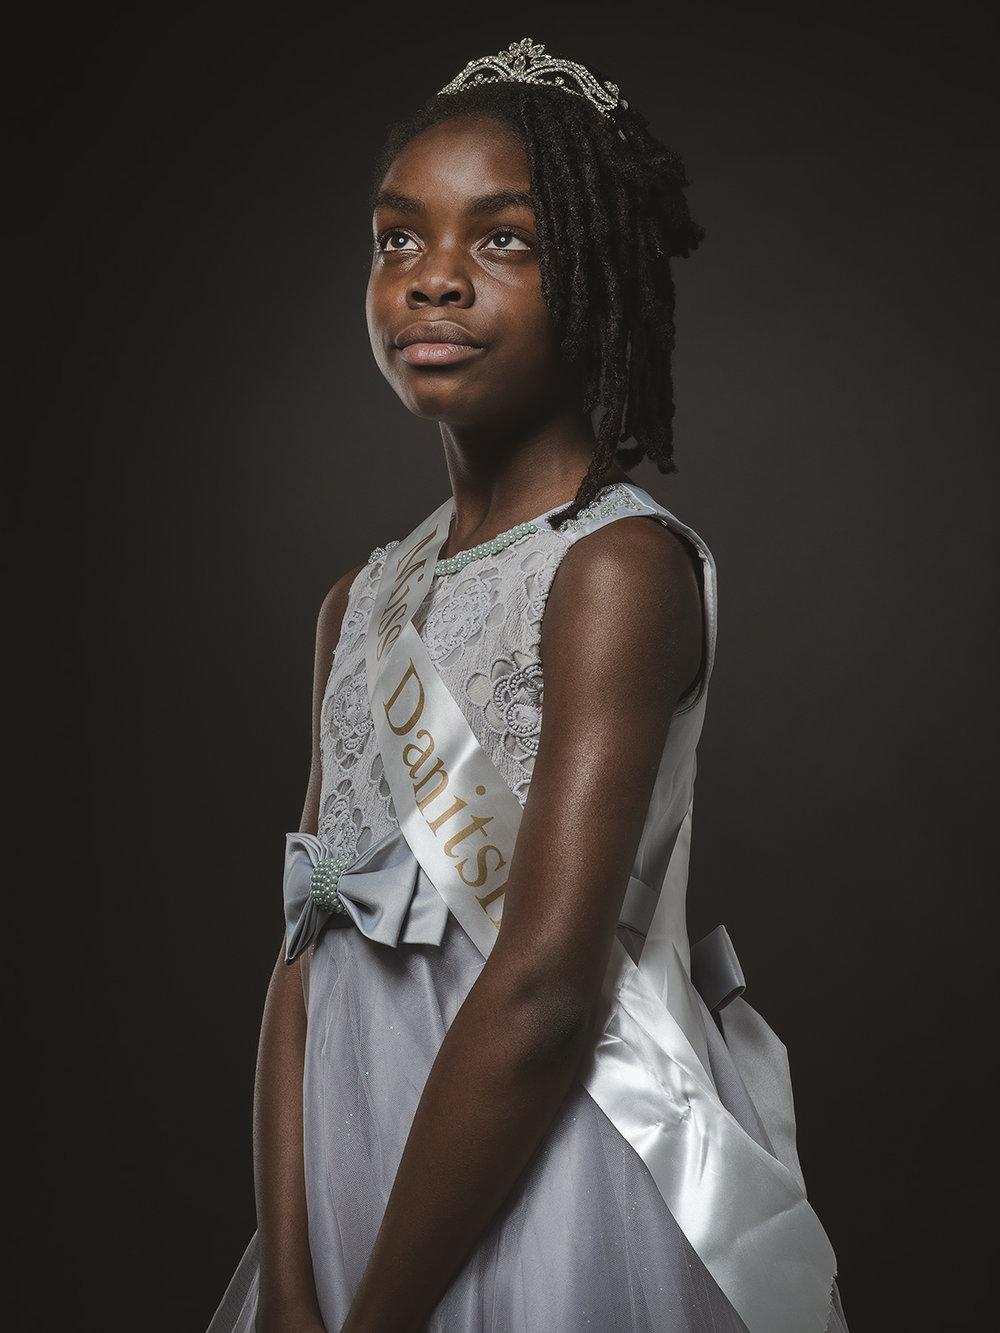 Danitsha, aged 11